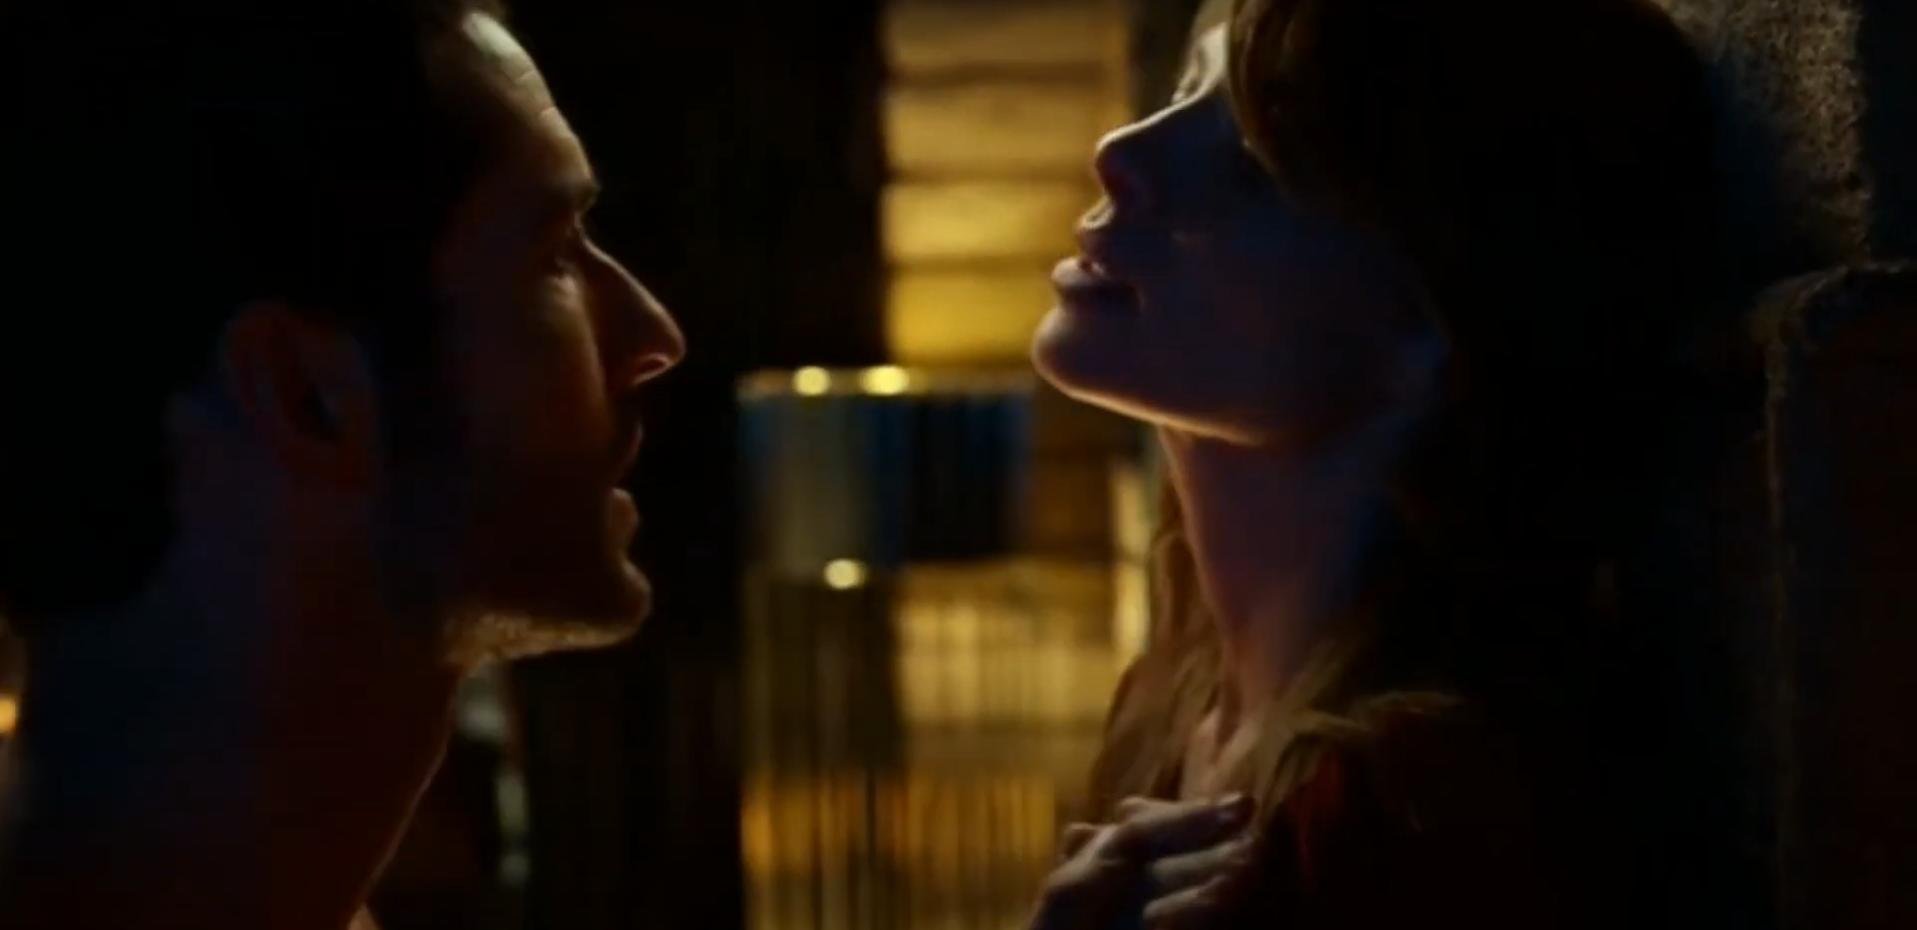 Скриншот сцены 18+ Люцифер и Хлоя